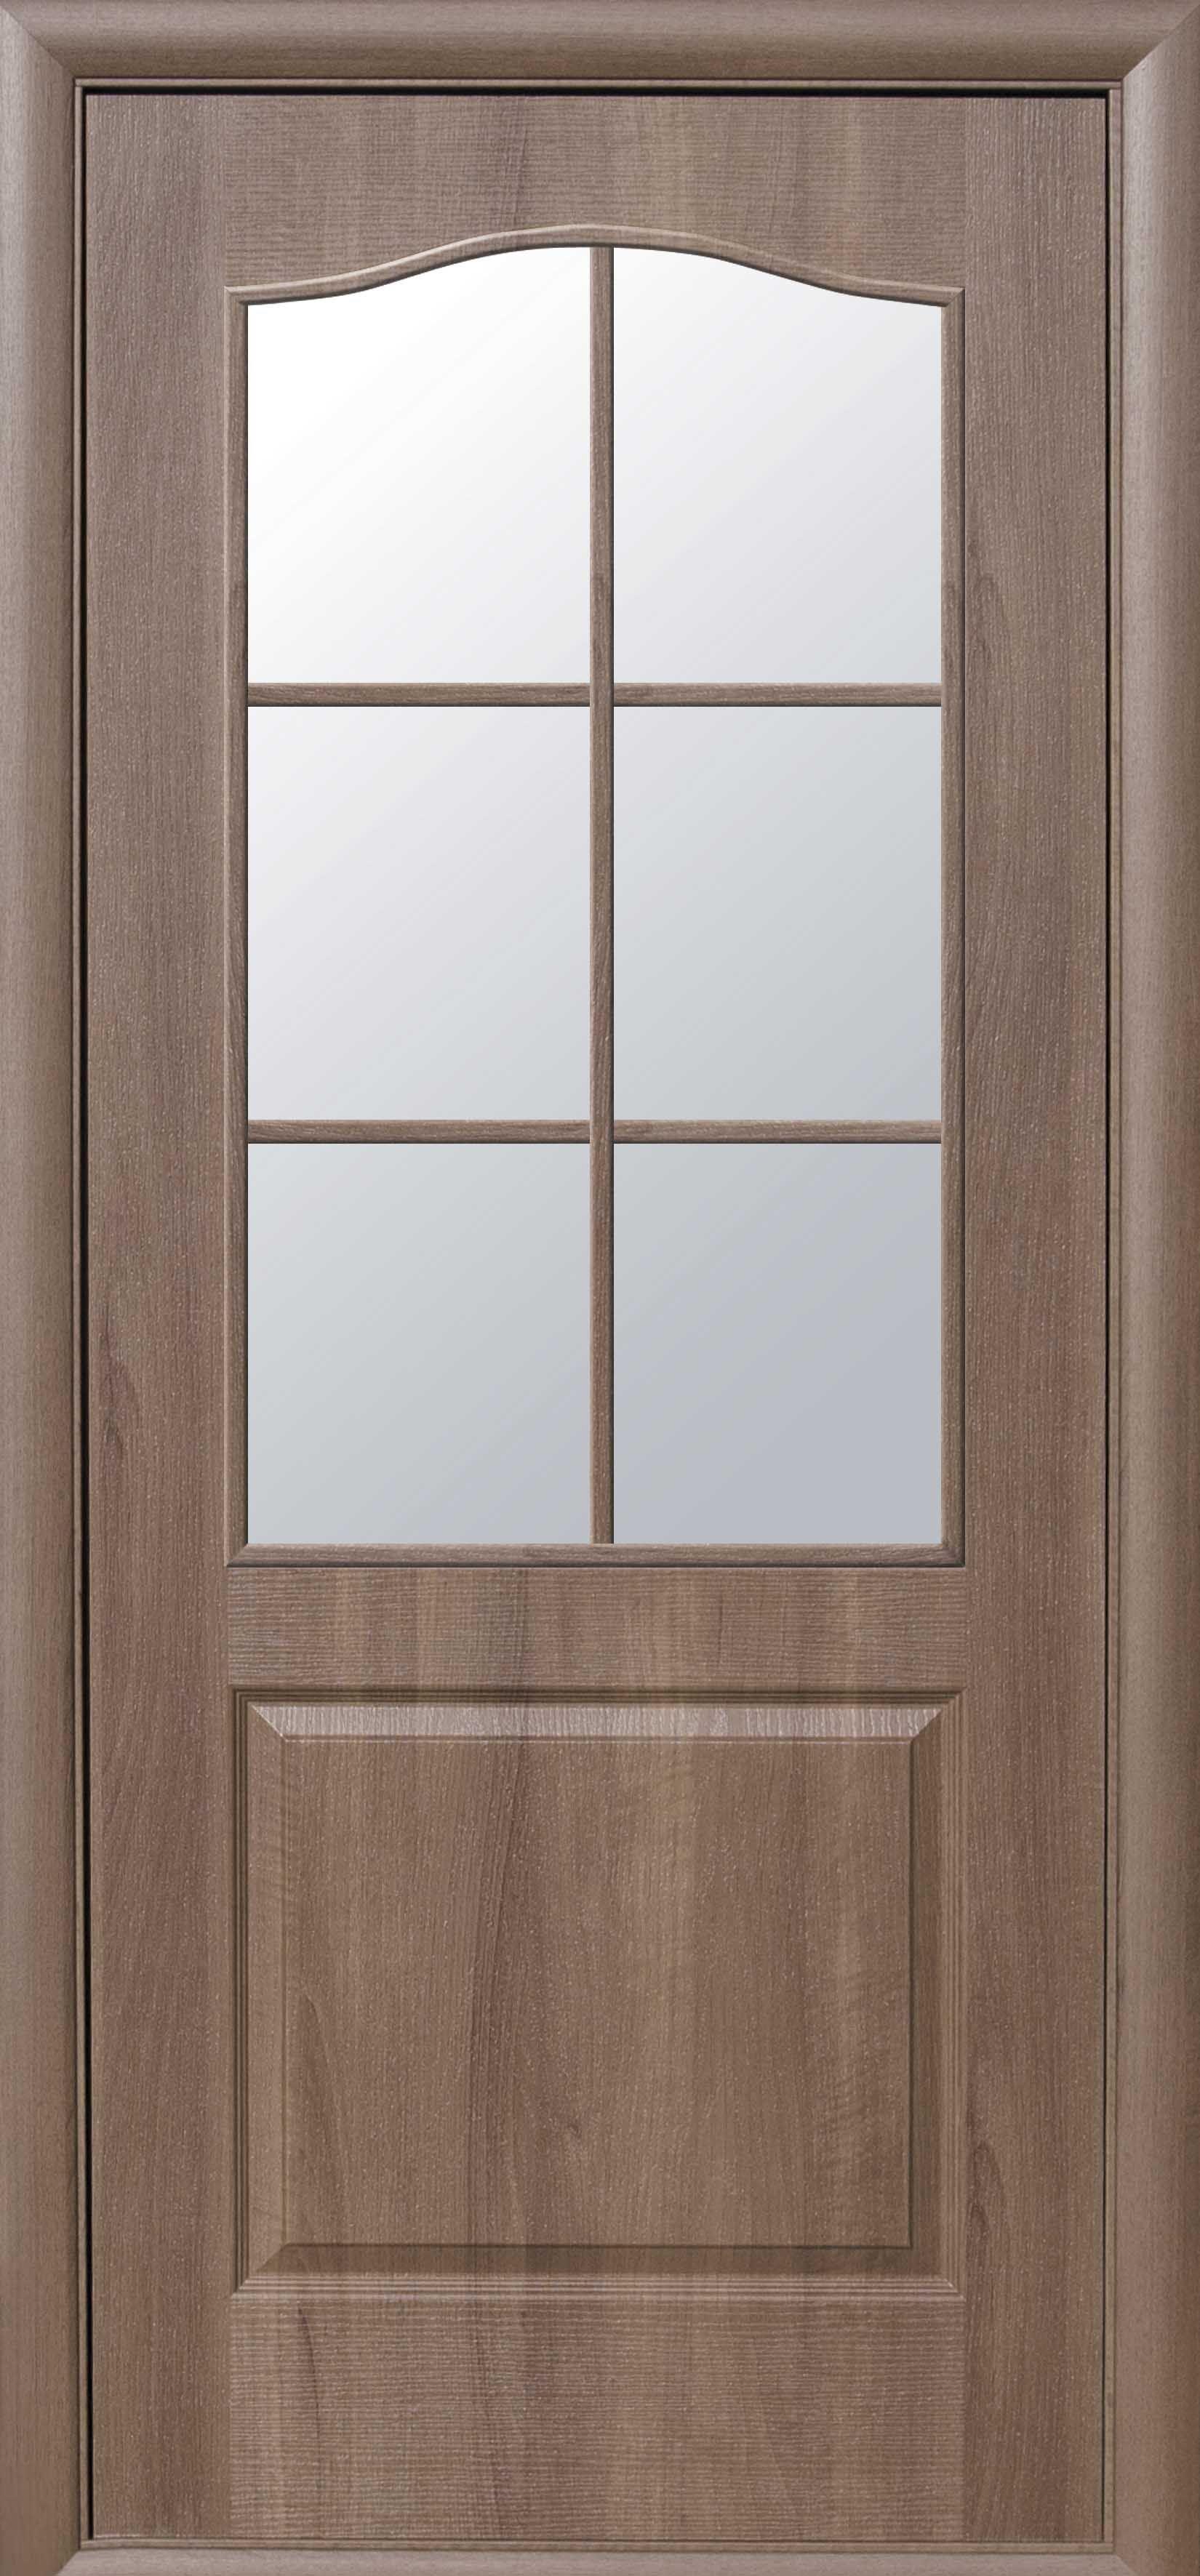 Межкомнатные двери Классик со стеклом сатин